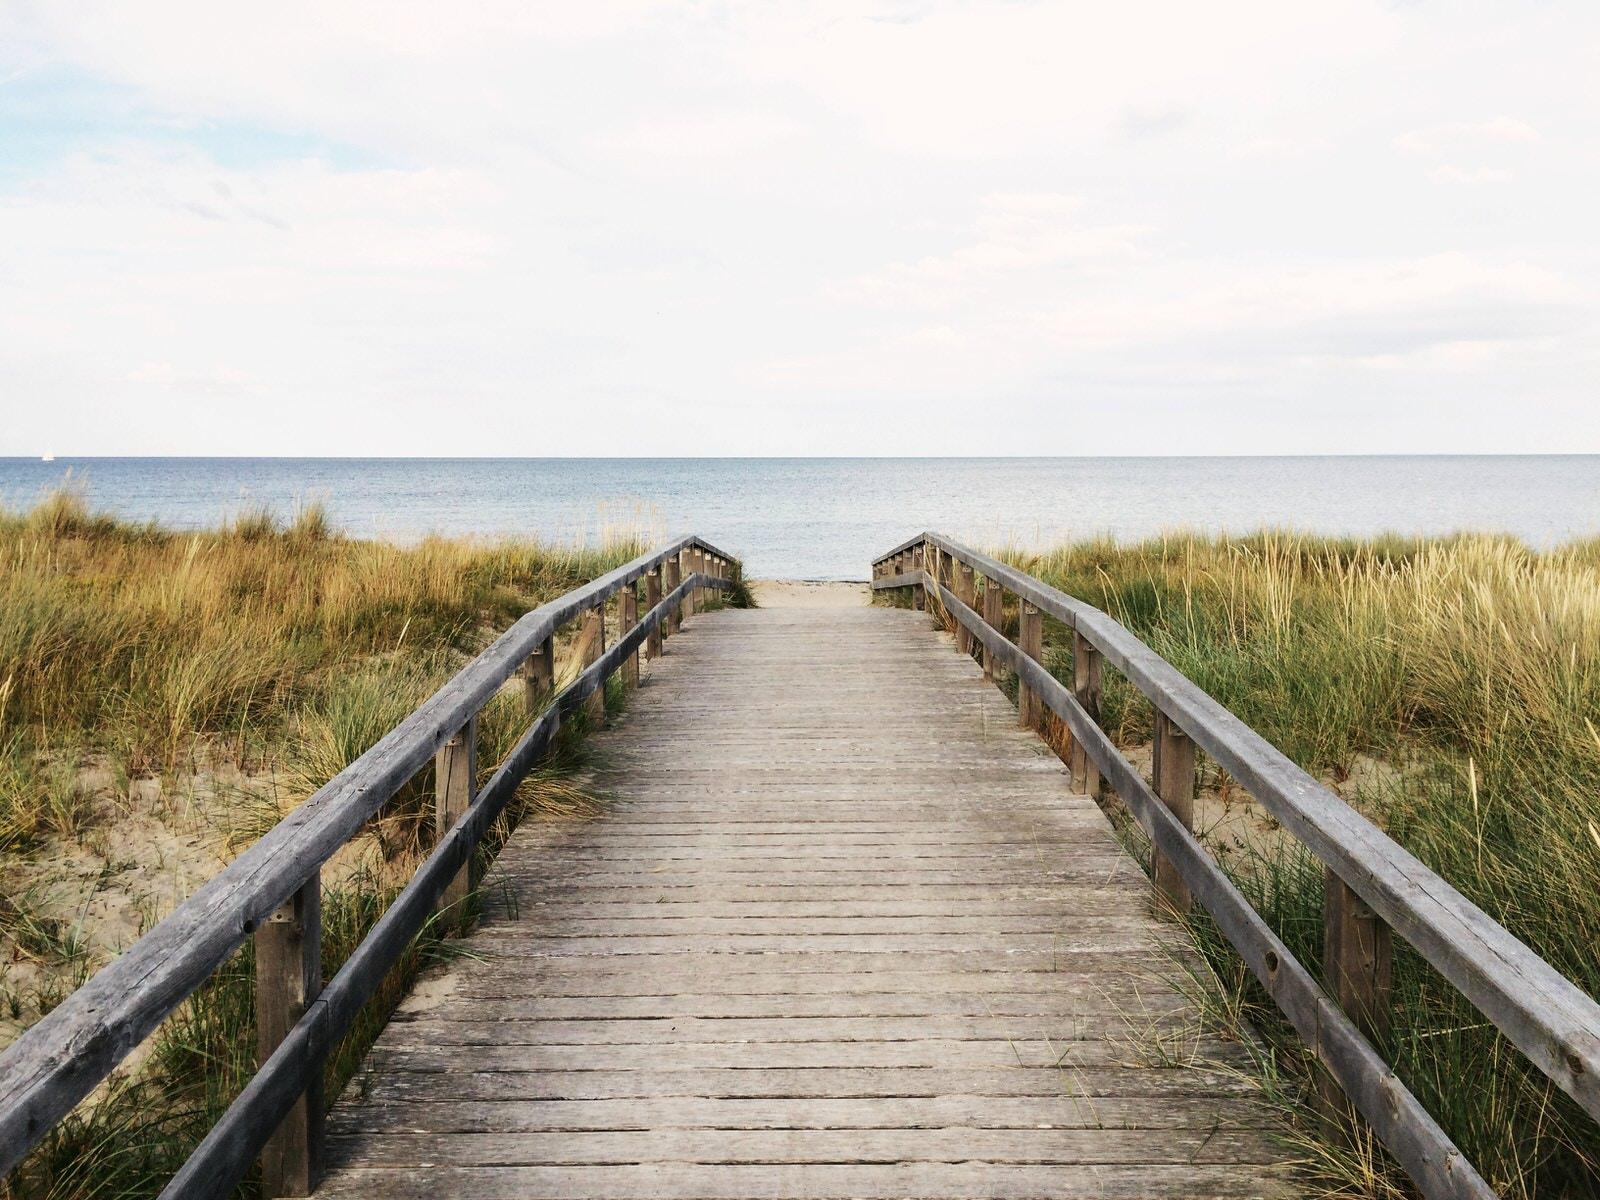 Walkway to the sea